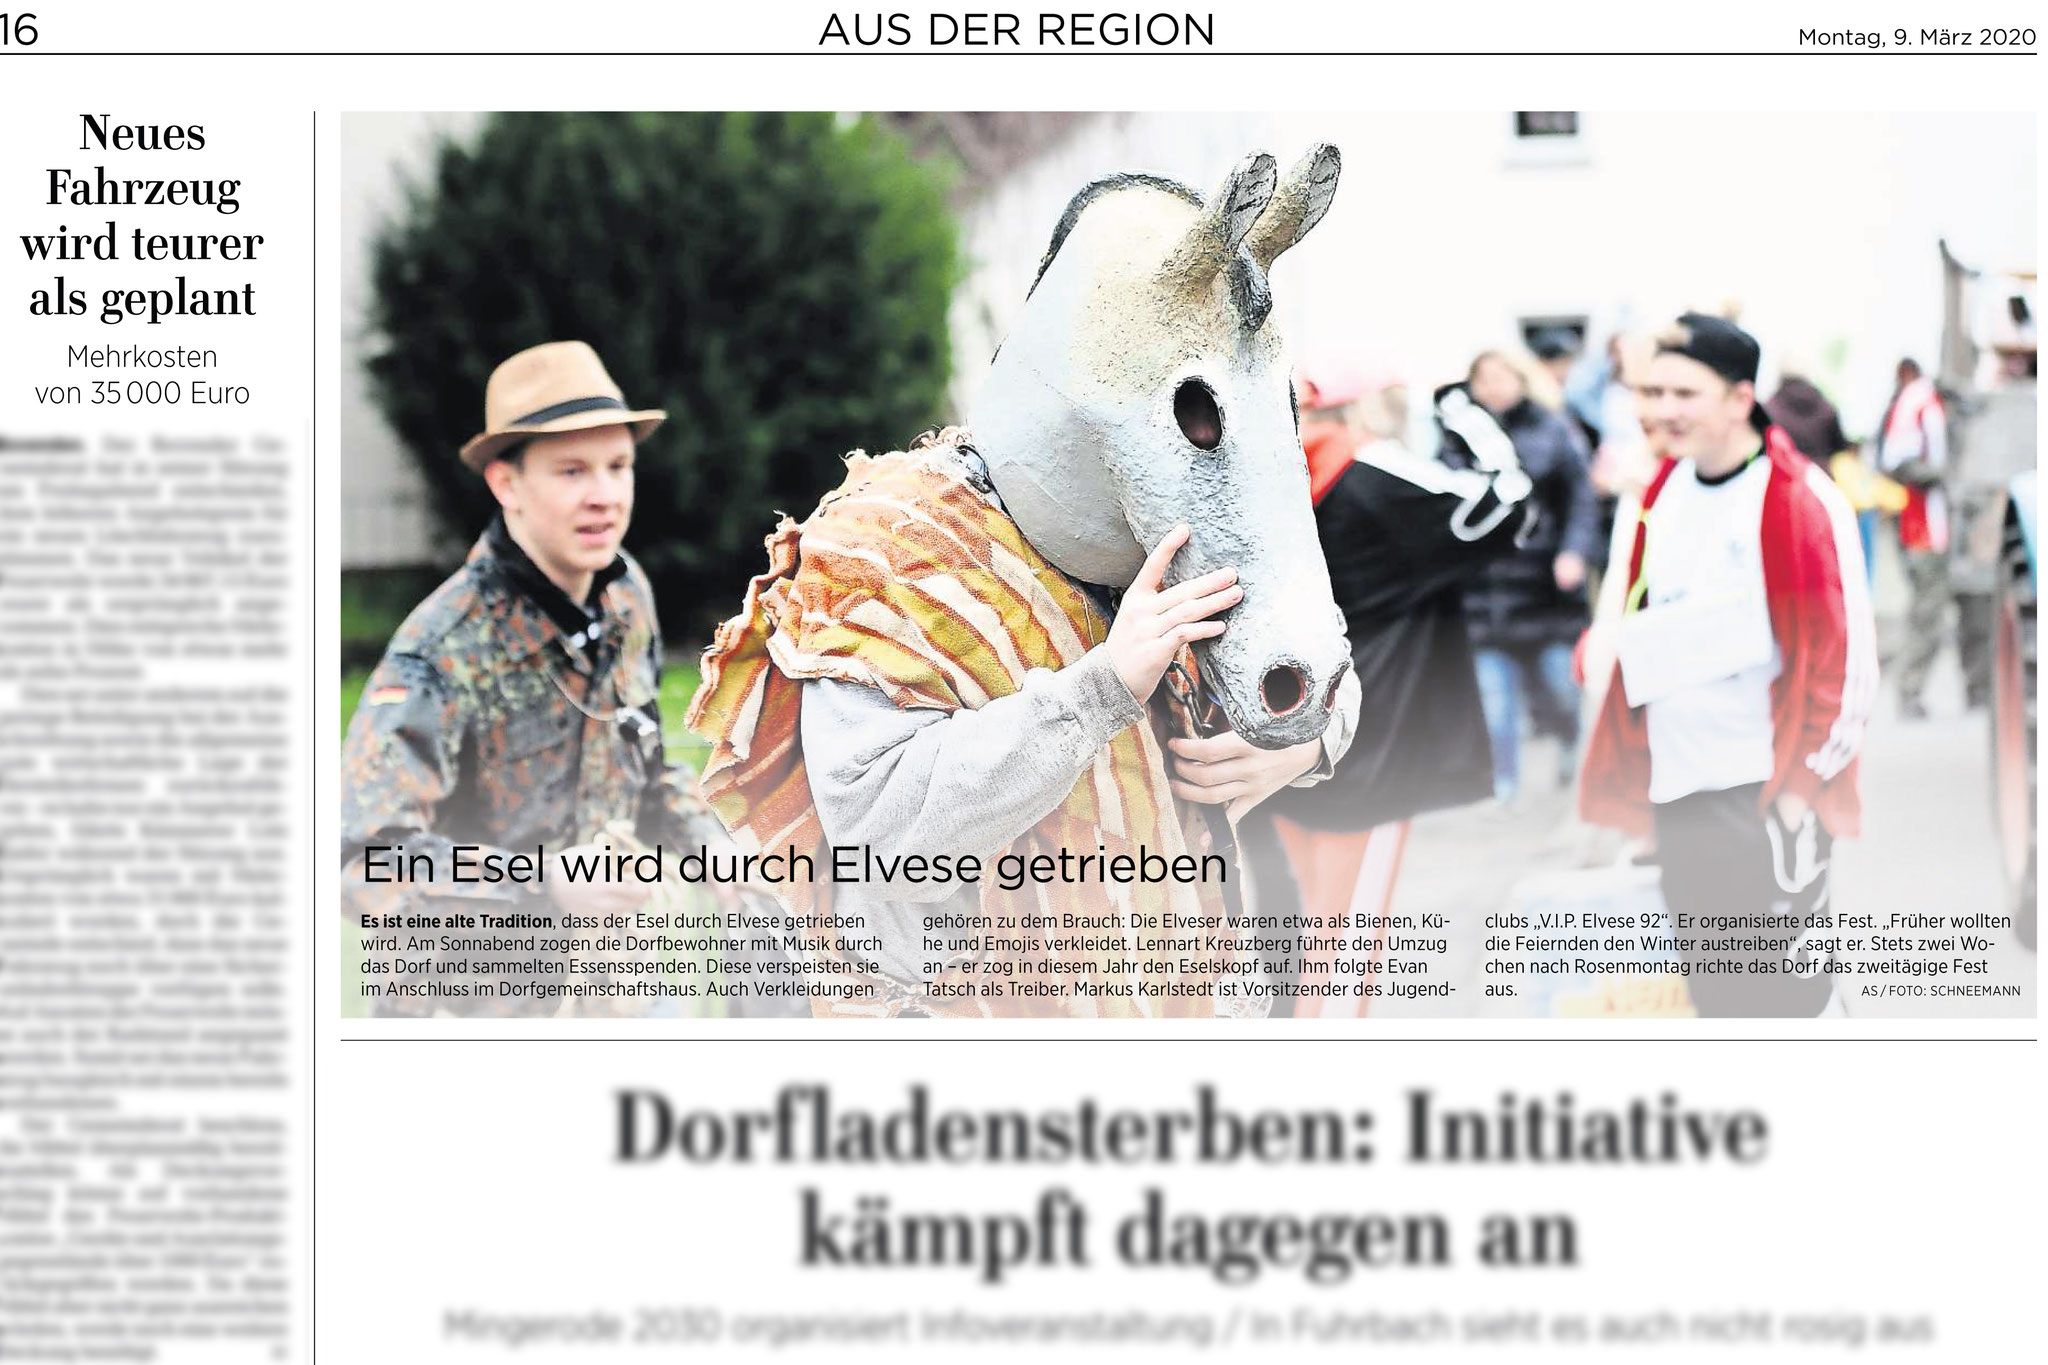 Göttinger Tageblatt: Eselfest in Elvese